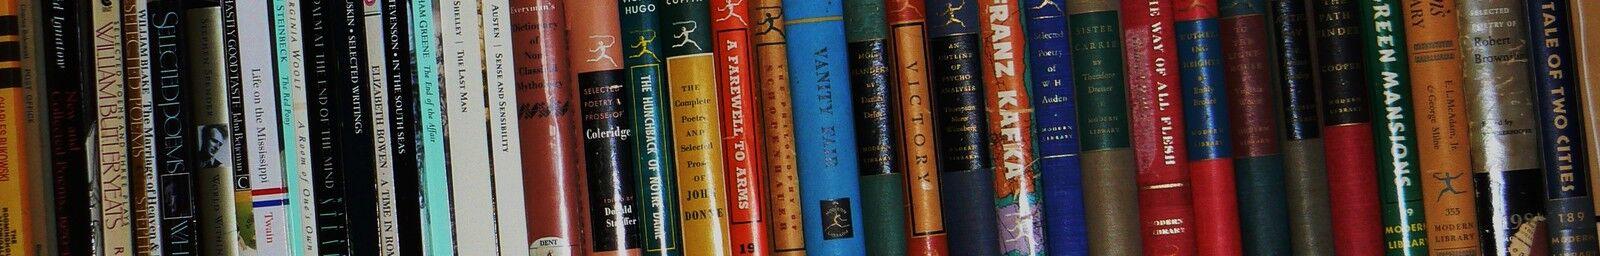 Scholar and Poet Books